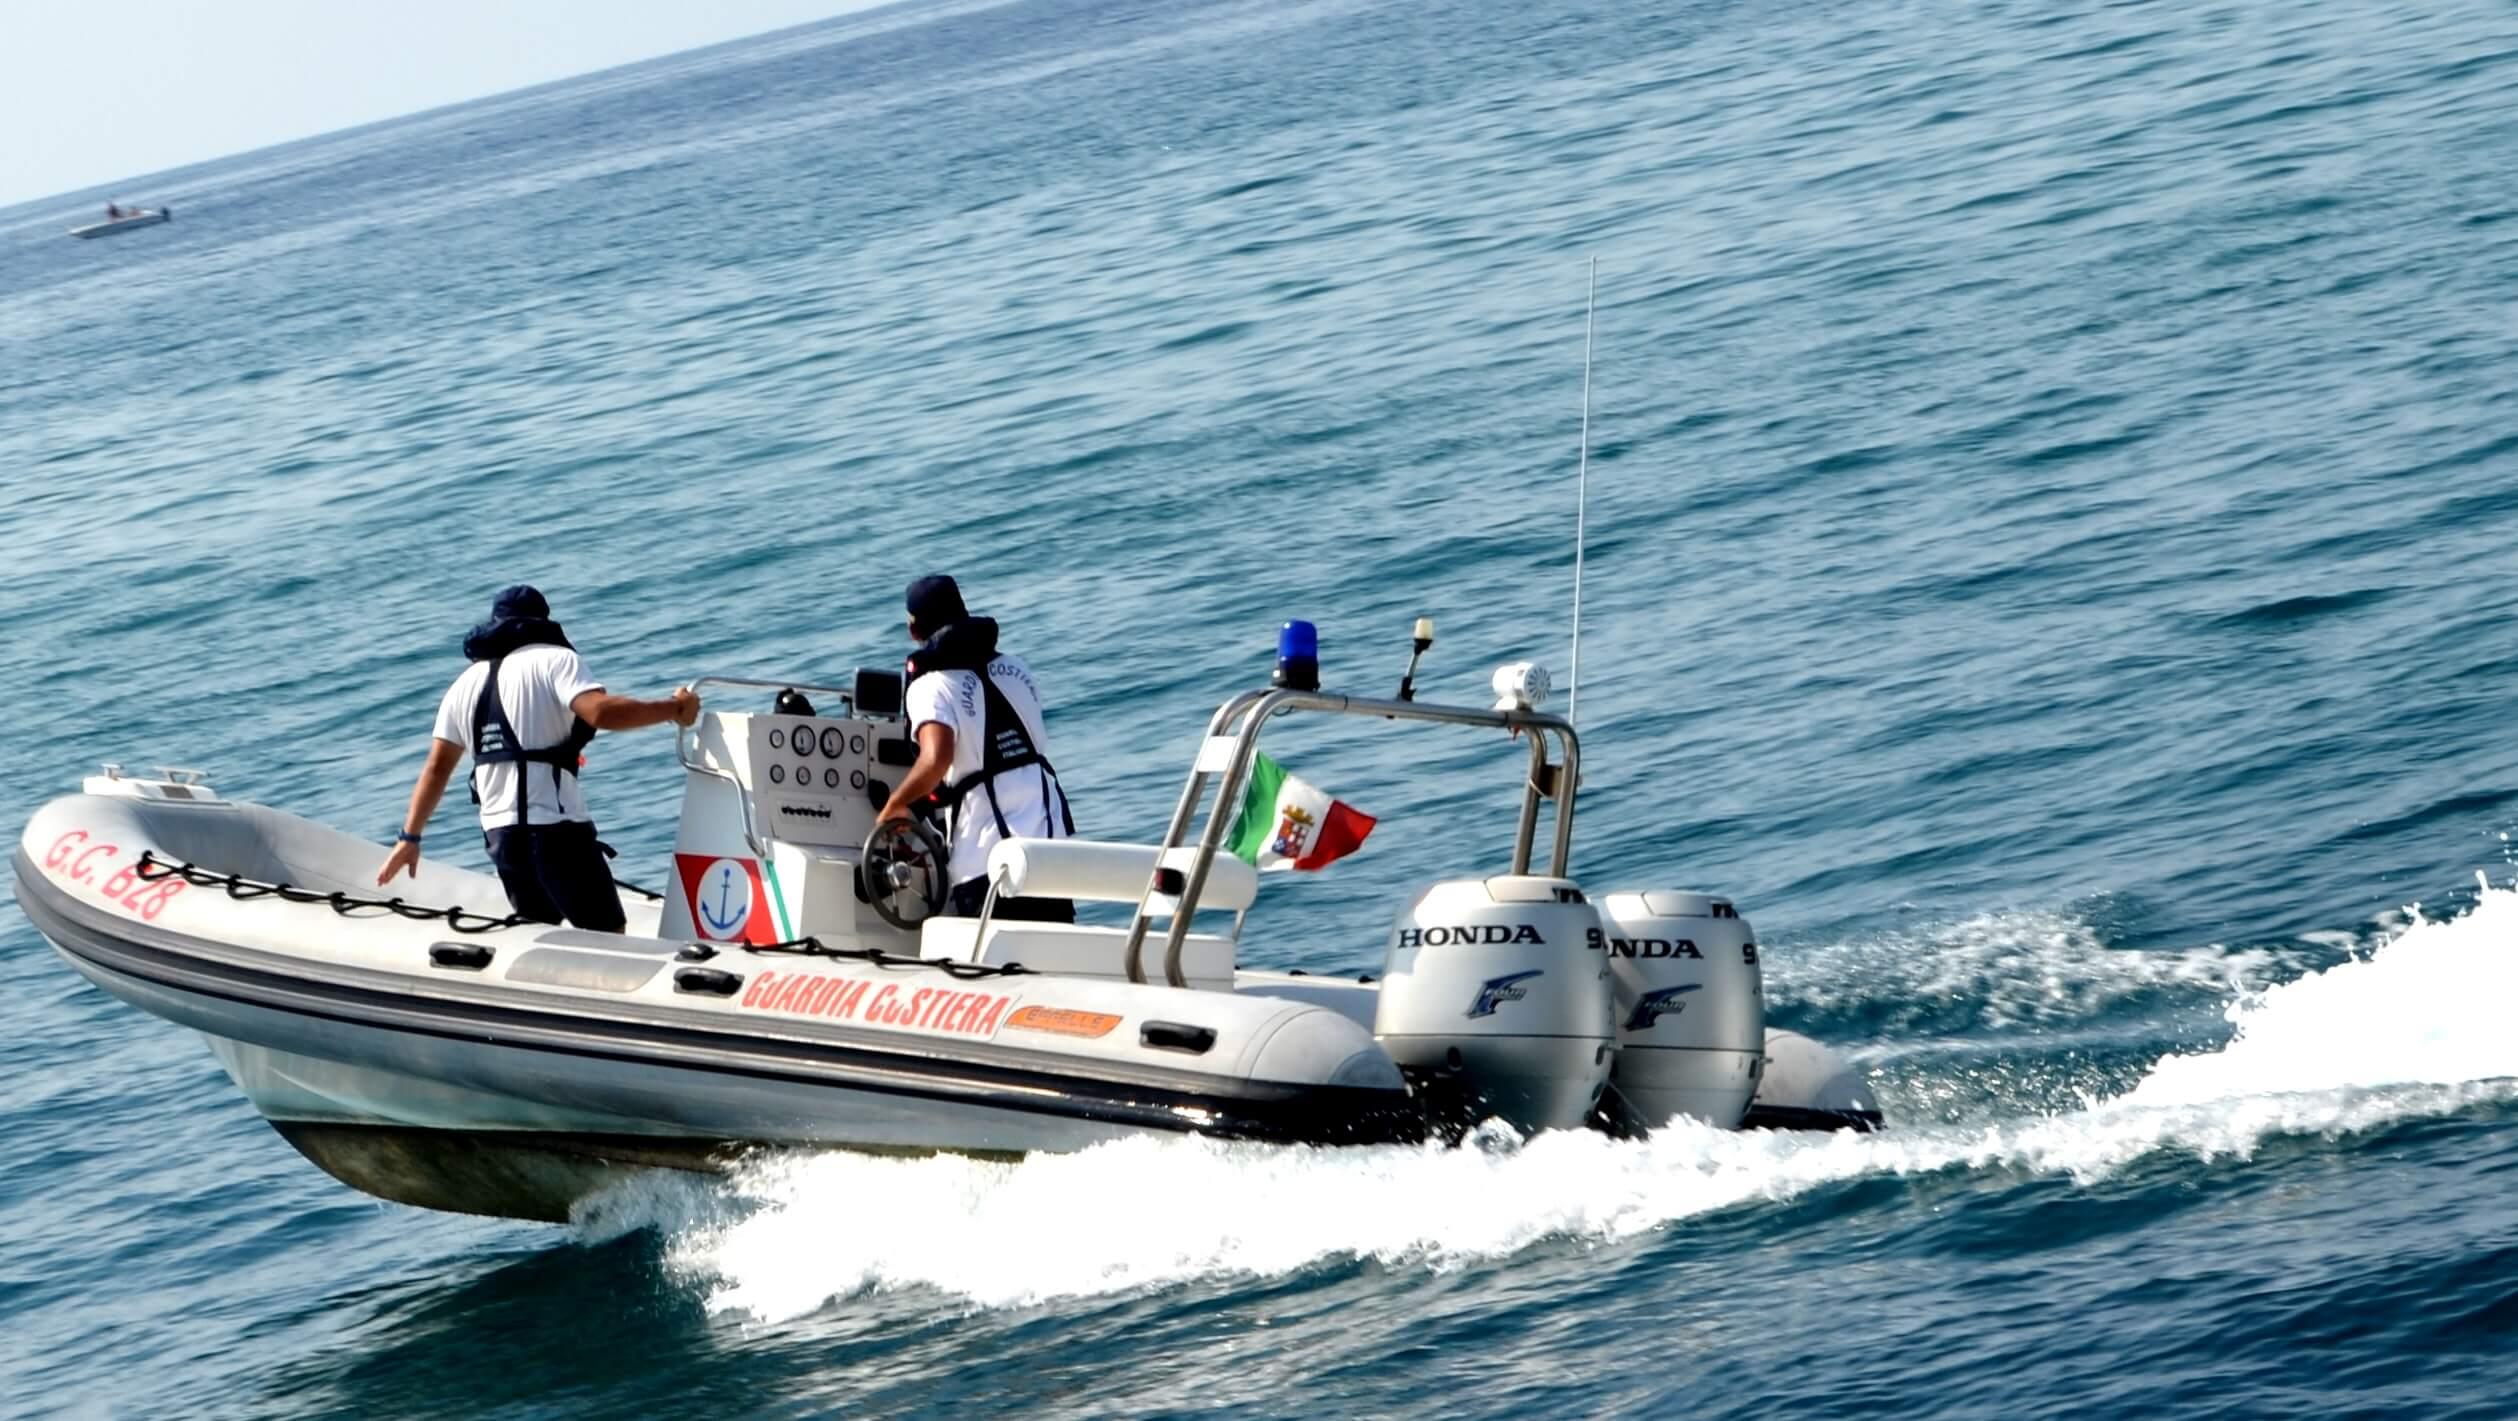 Guardia Costiera ricerca ragazzi gambiani